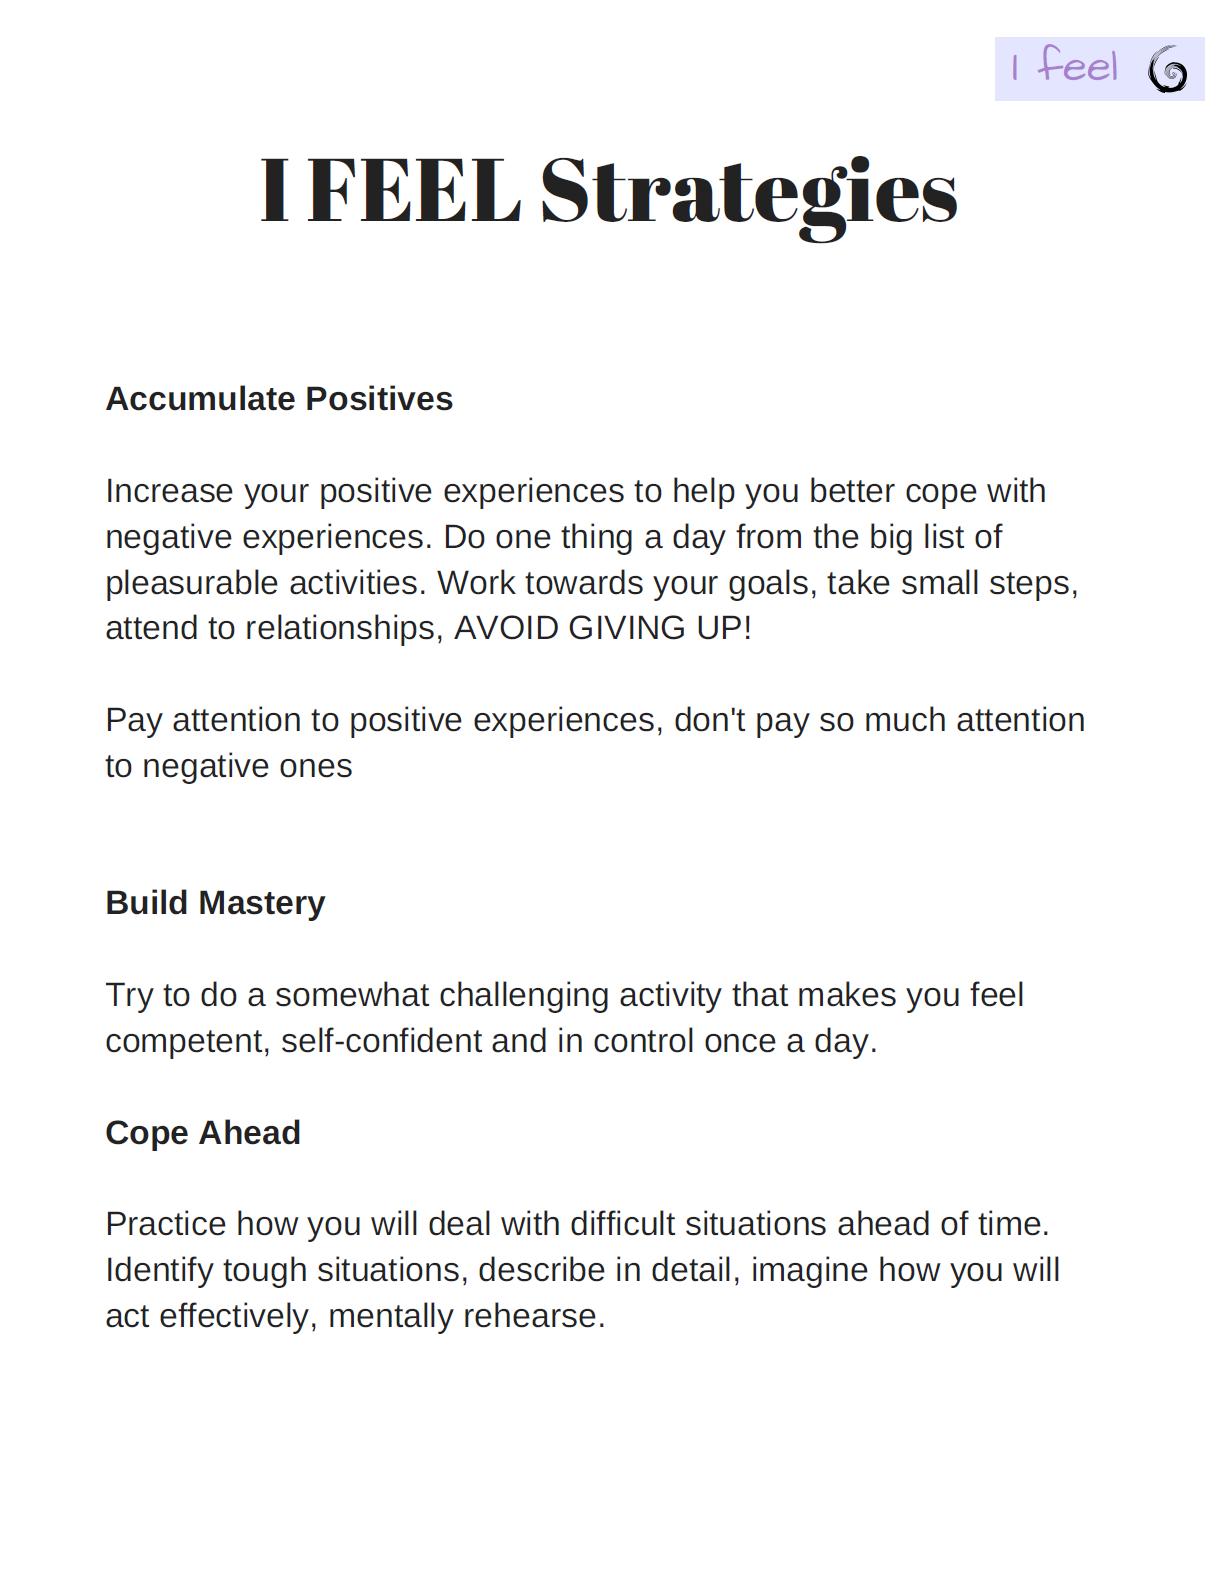 I Feel Strategies